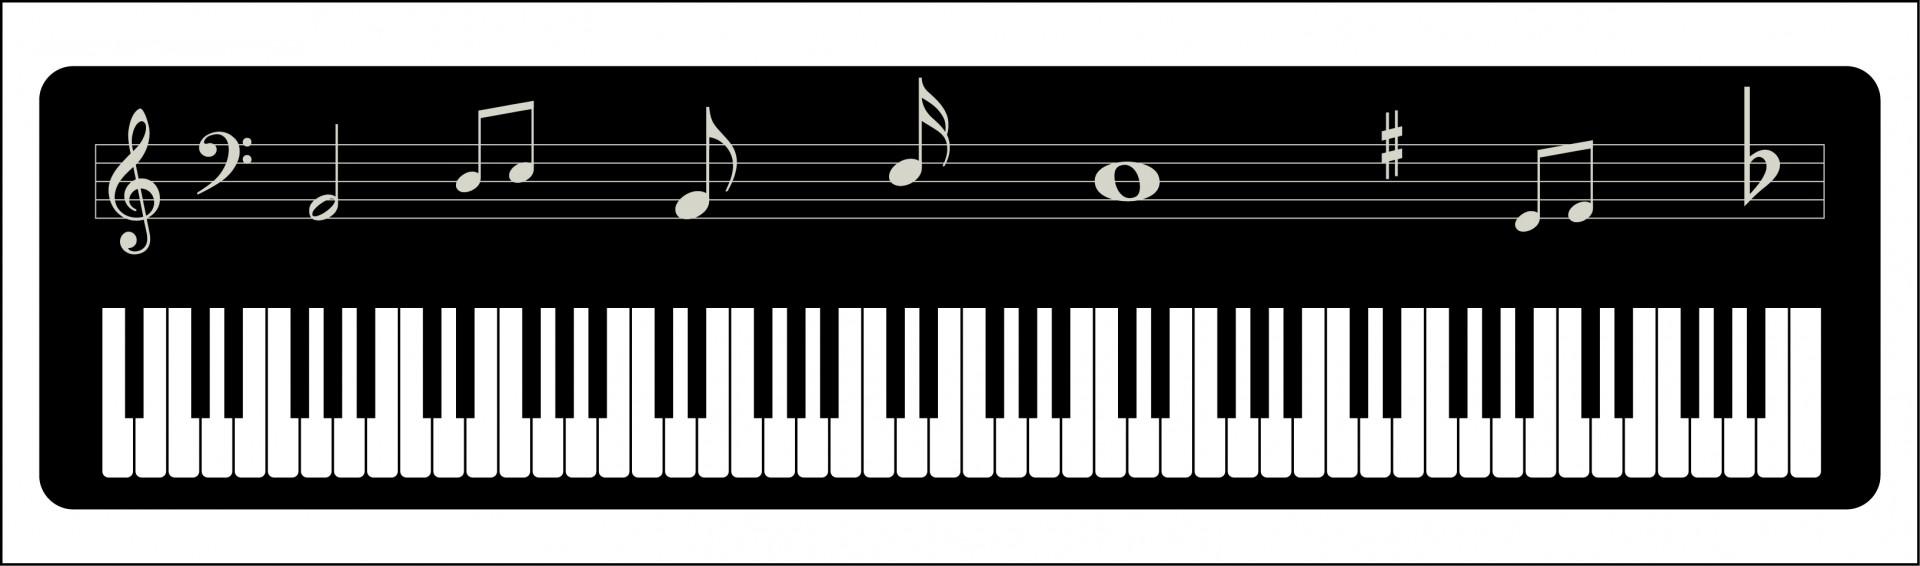 Piano Keyboard Musical Notes Free Stock Photo.